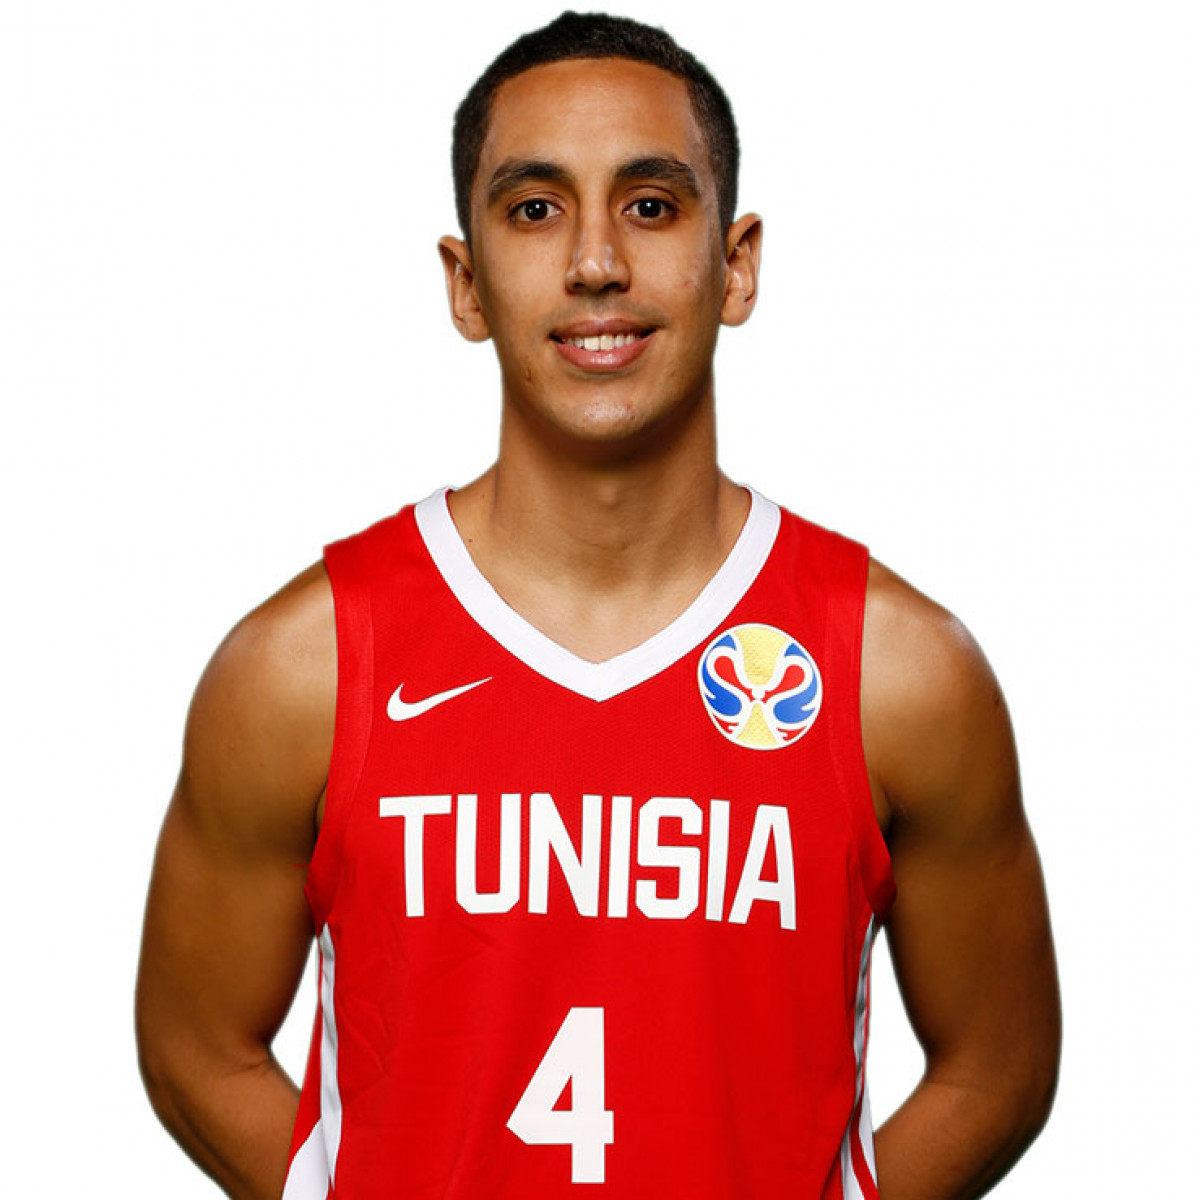 Photo of Omar Abada, 2019-2020 season